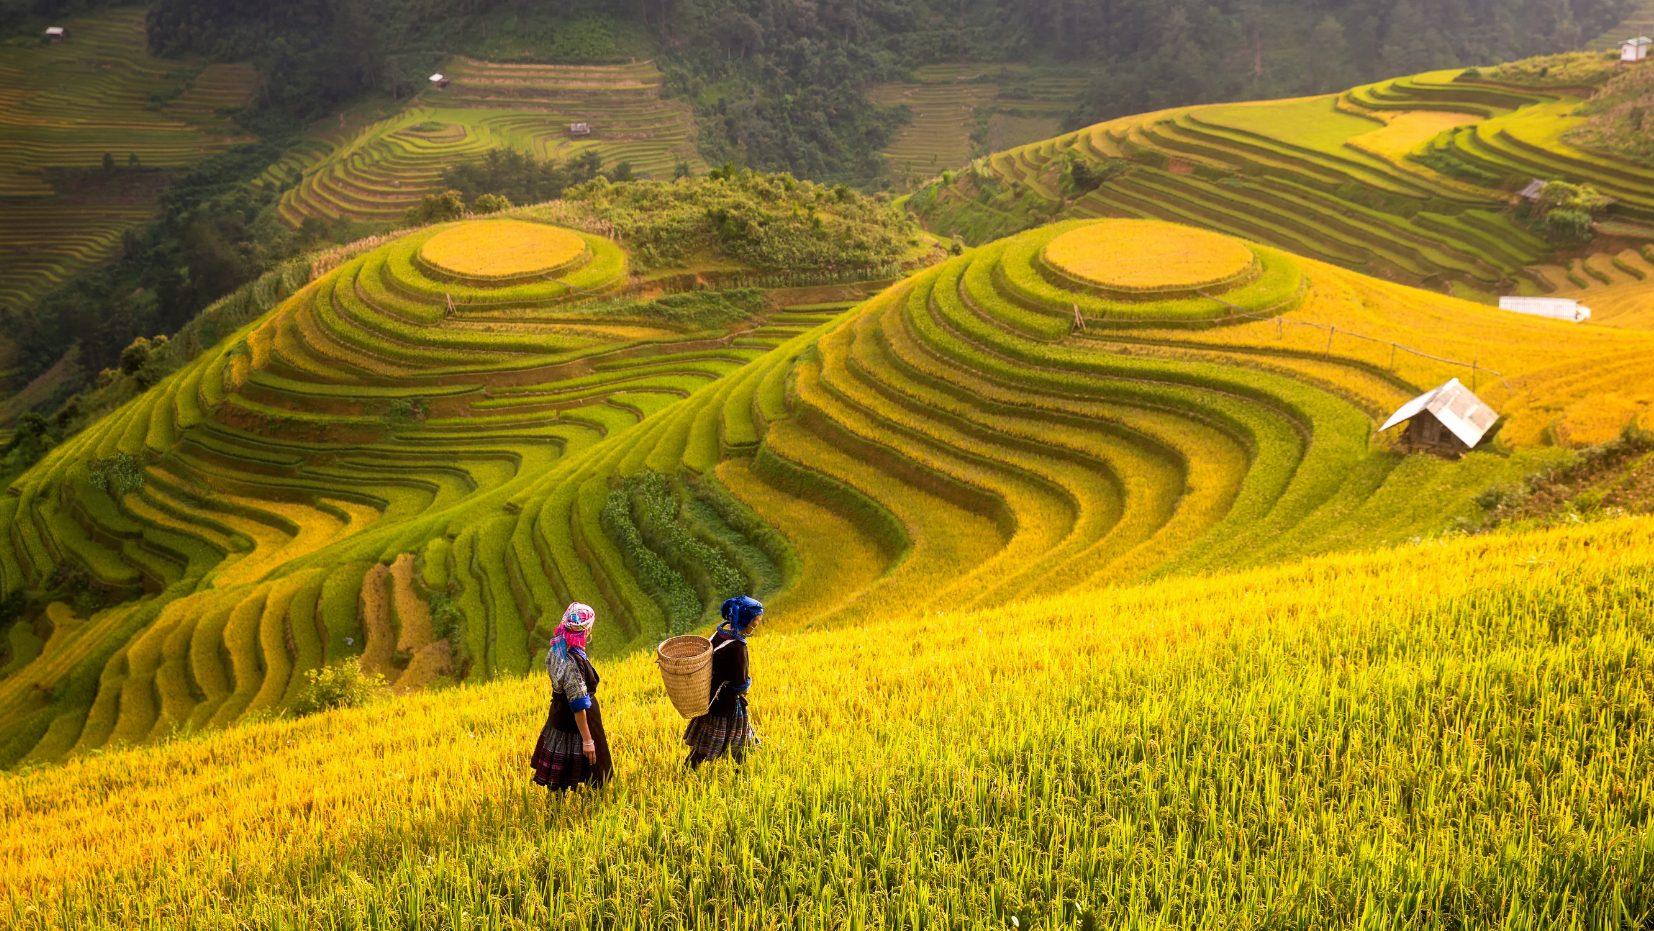 Tranh Phong Cảnh - 10525